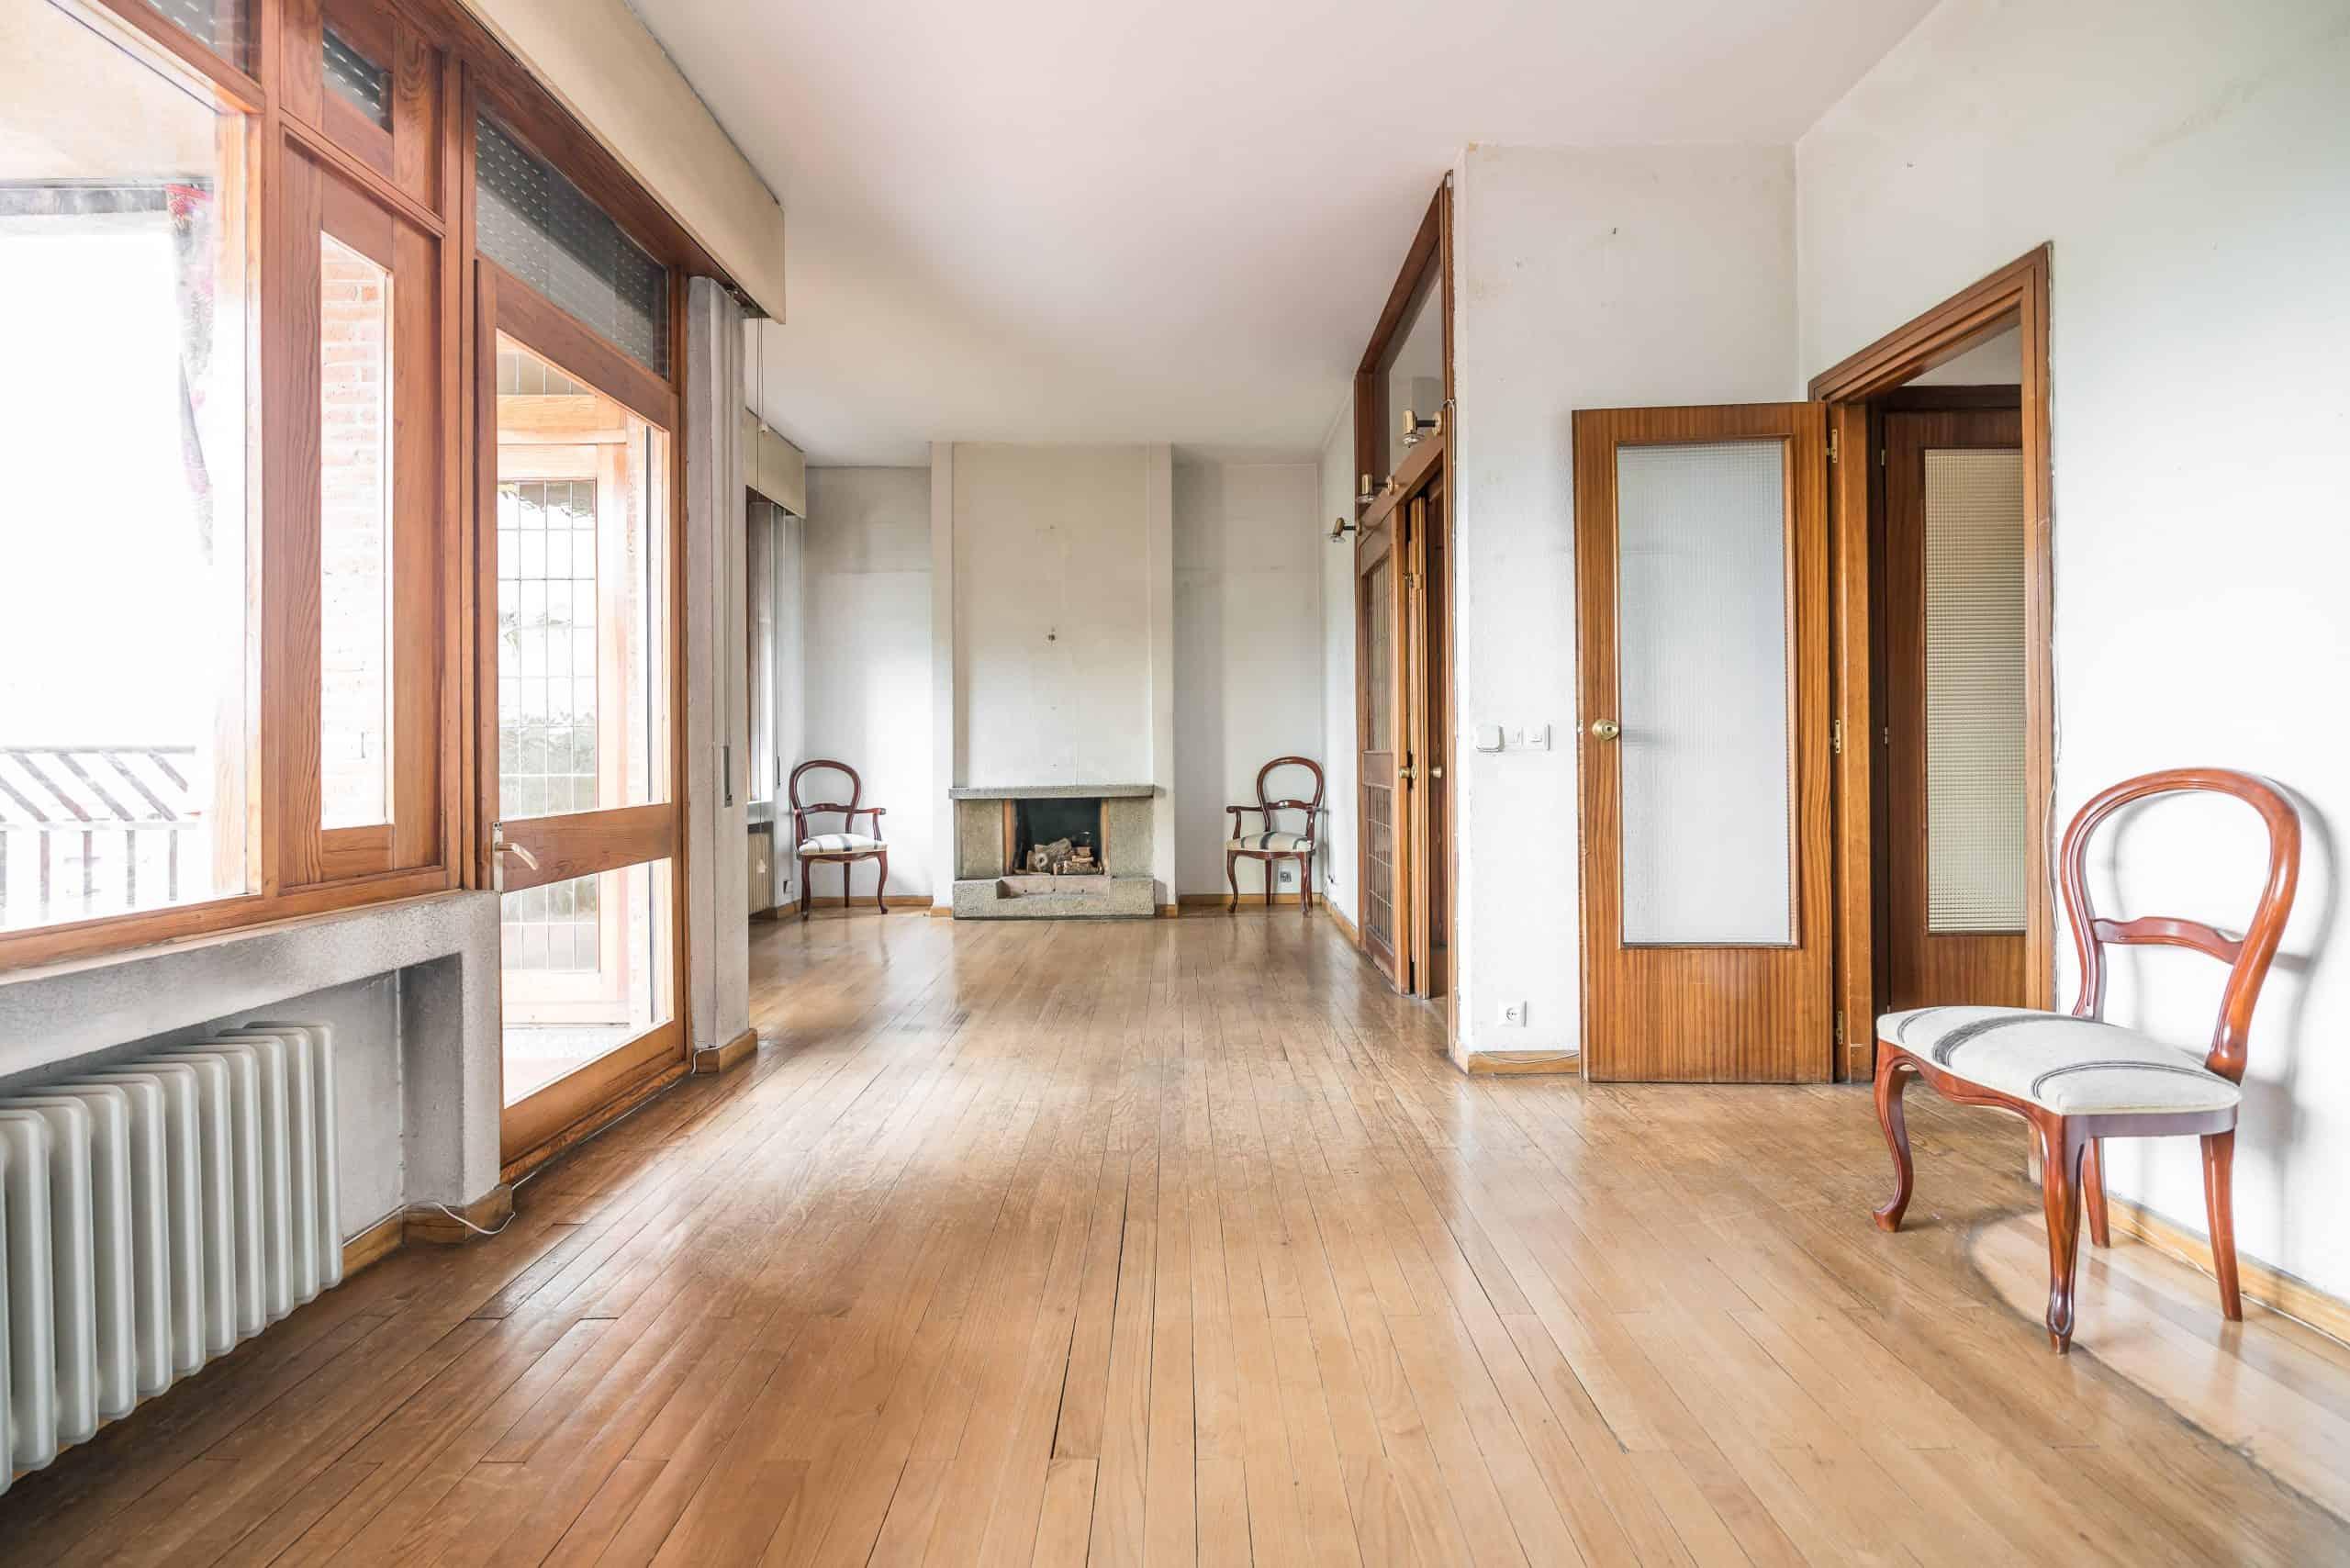 Agencia Inmobiliaria de Madrid-FUTUROCASA-Zona ARGANZUELA-EMBAJADORES-LEGAZPI -calle Embajadores- baño 2